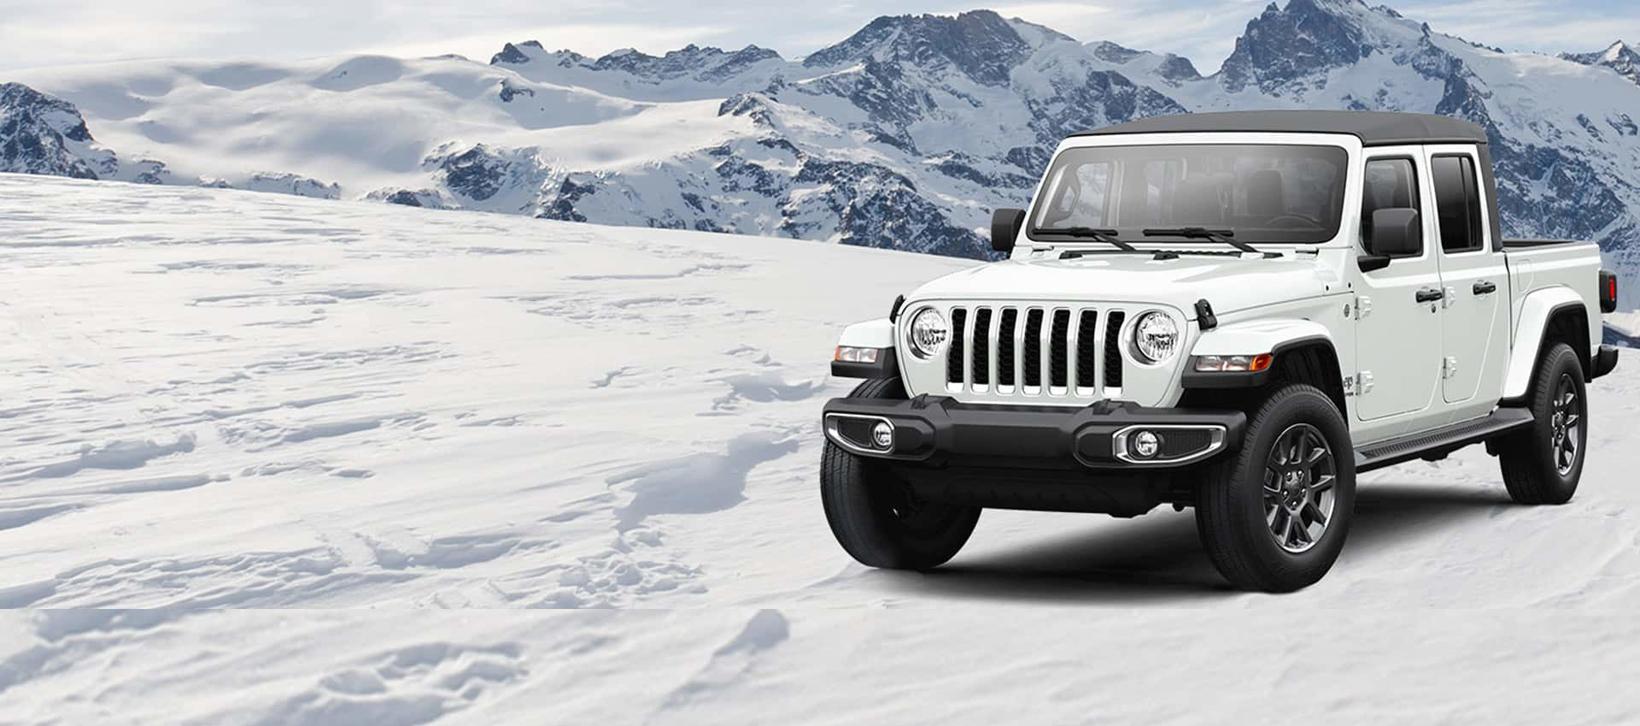 usdt自动充提教程网(www.6allbet.com):FCA将在印度投资2.5亿美元,生产多款Jeep车型